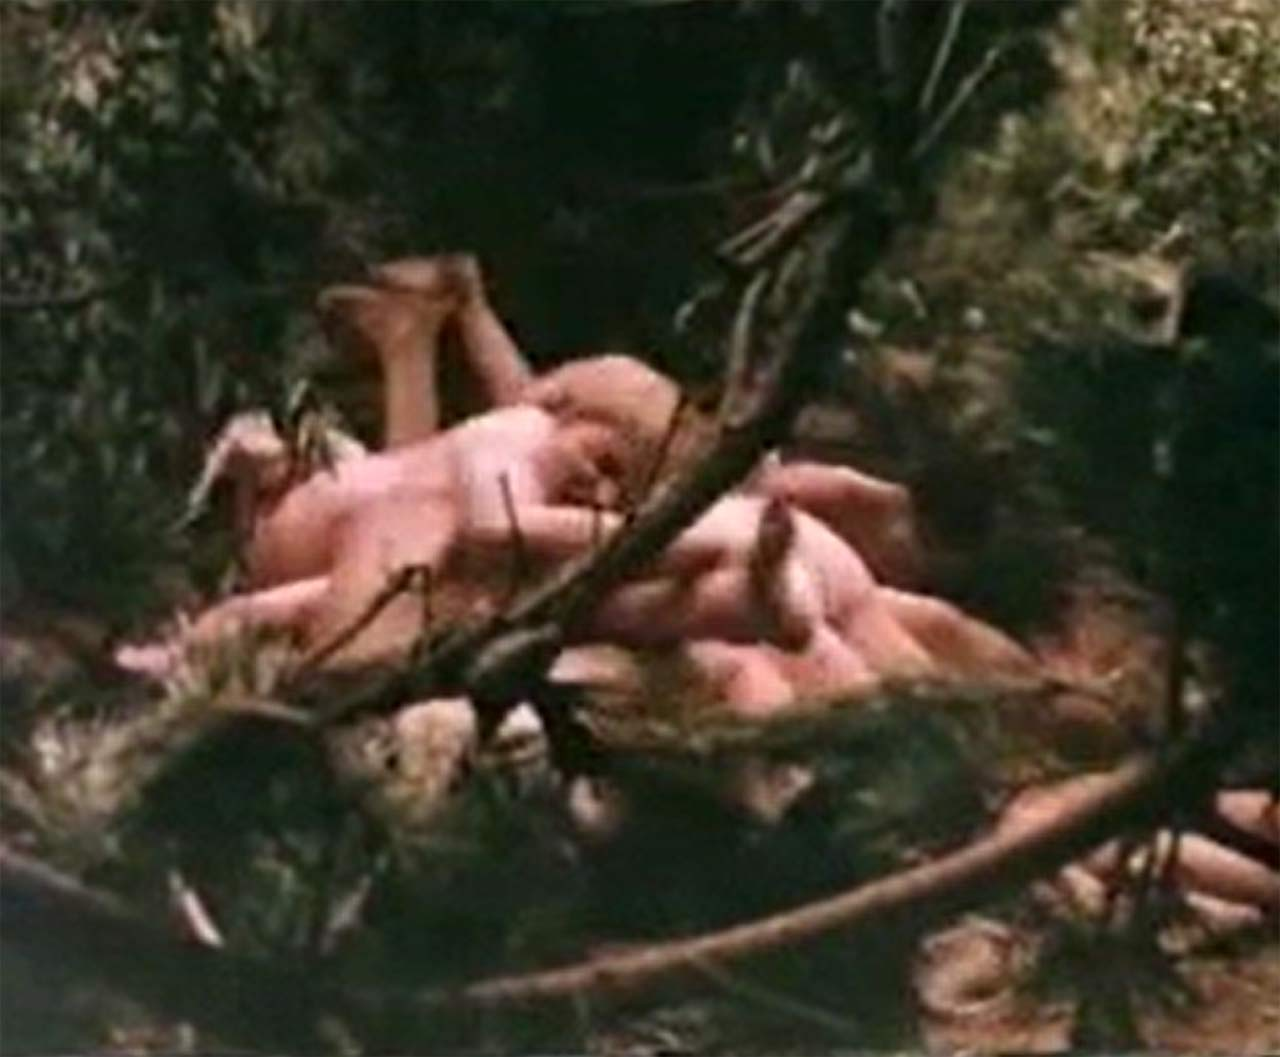 photo Catherine burns barbara hershey nude forced sex scene in last summer